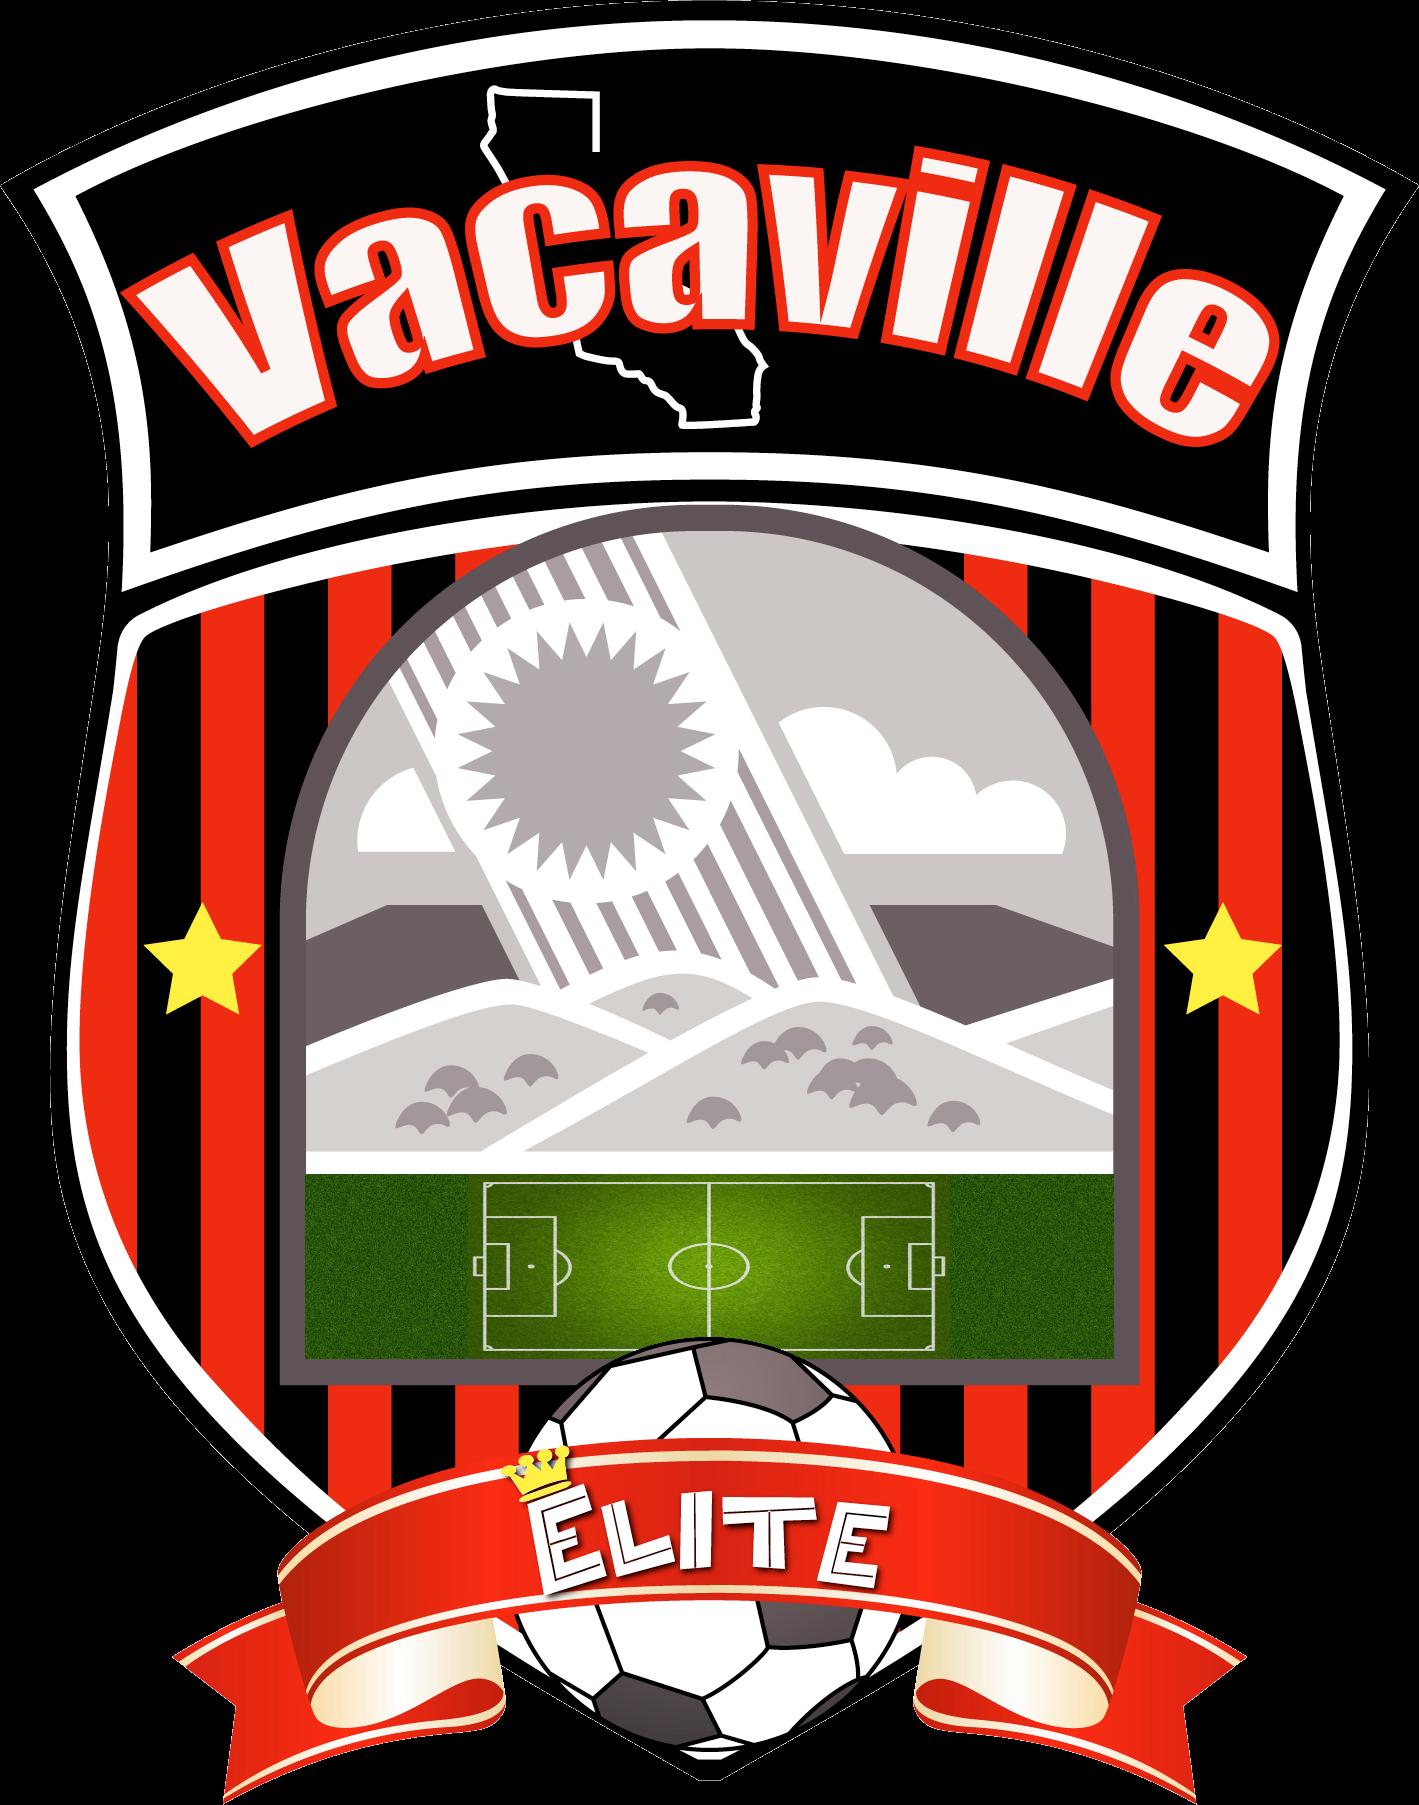 Vacaville Elite